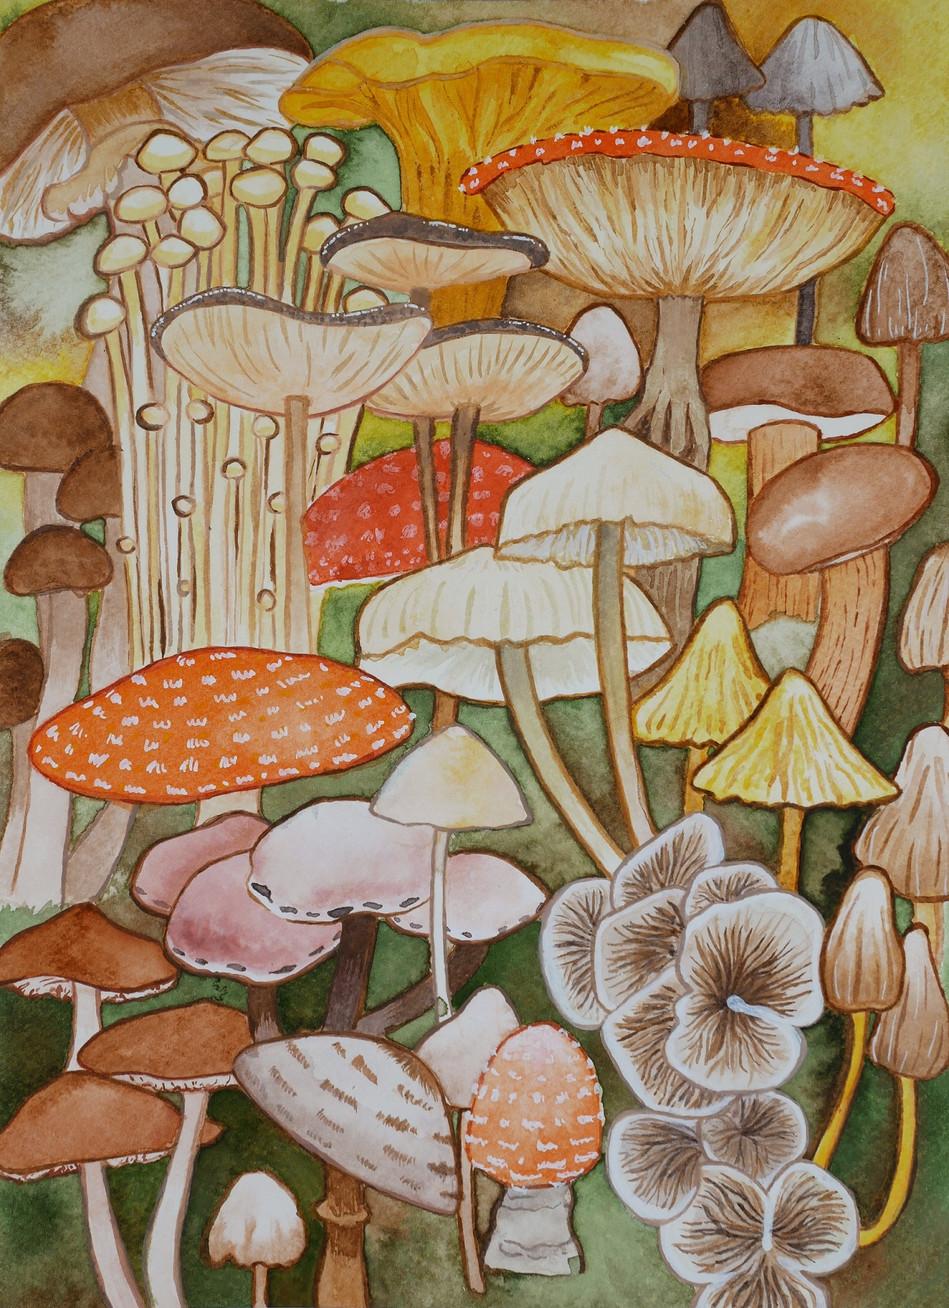 Mushroom study in ink